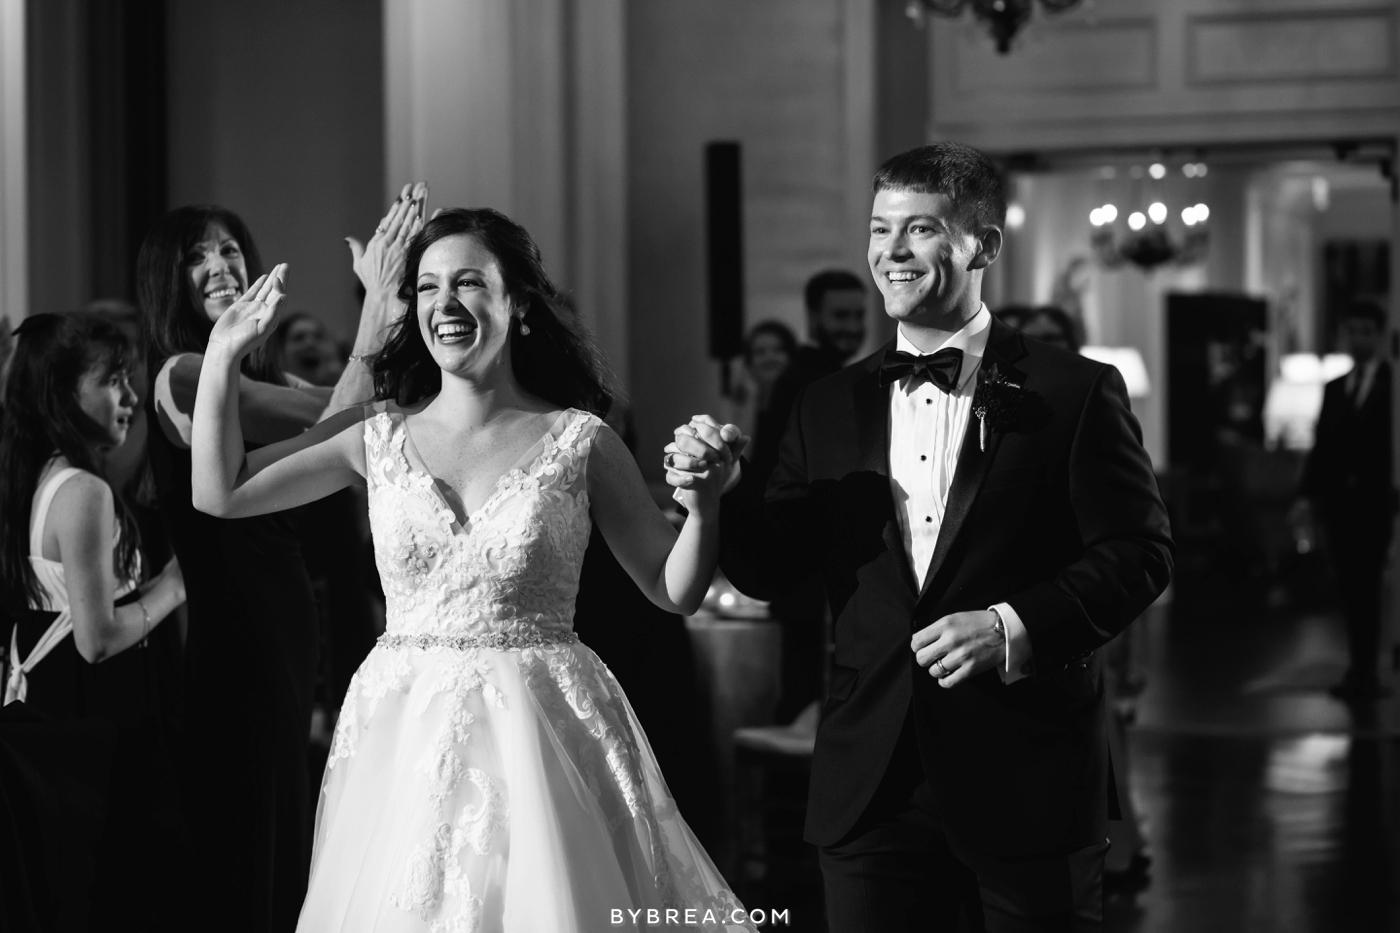 Baltimore wedding photo bride and groom enter reception